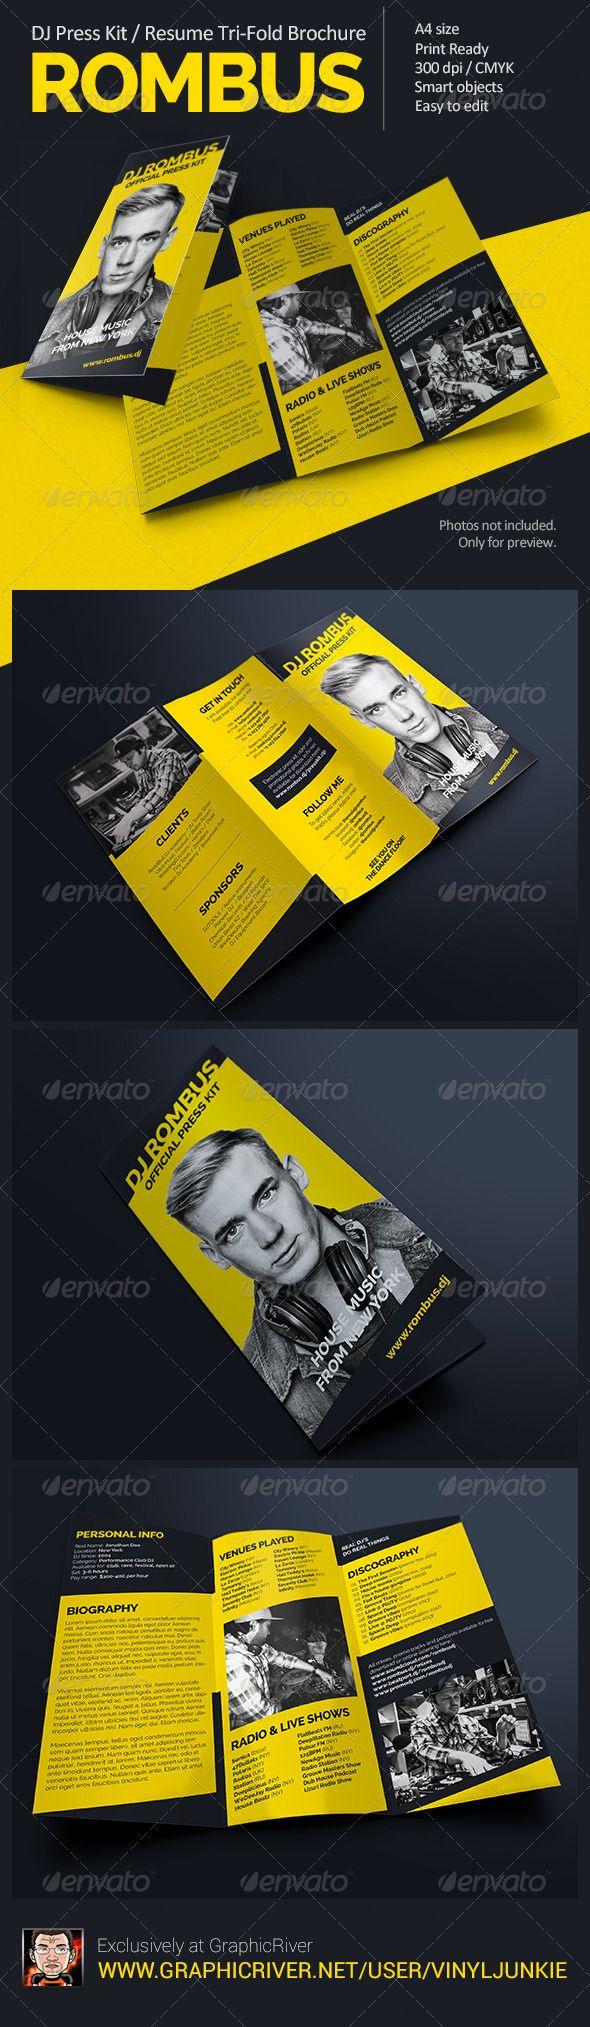 brochure resumes brochure resumes Militarybraliciousco